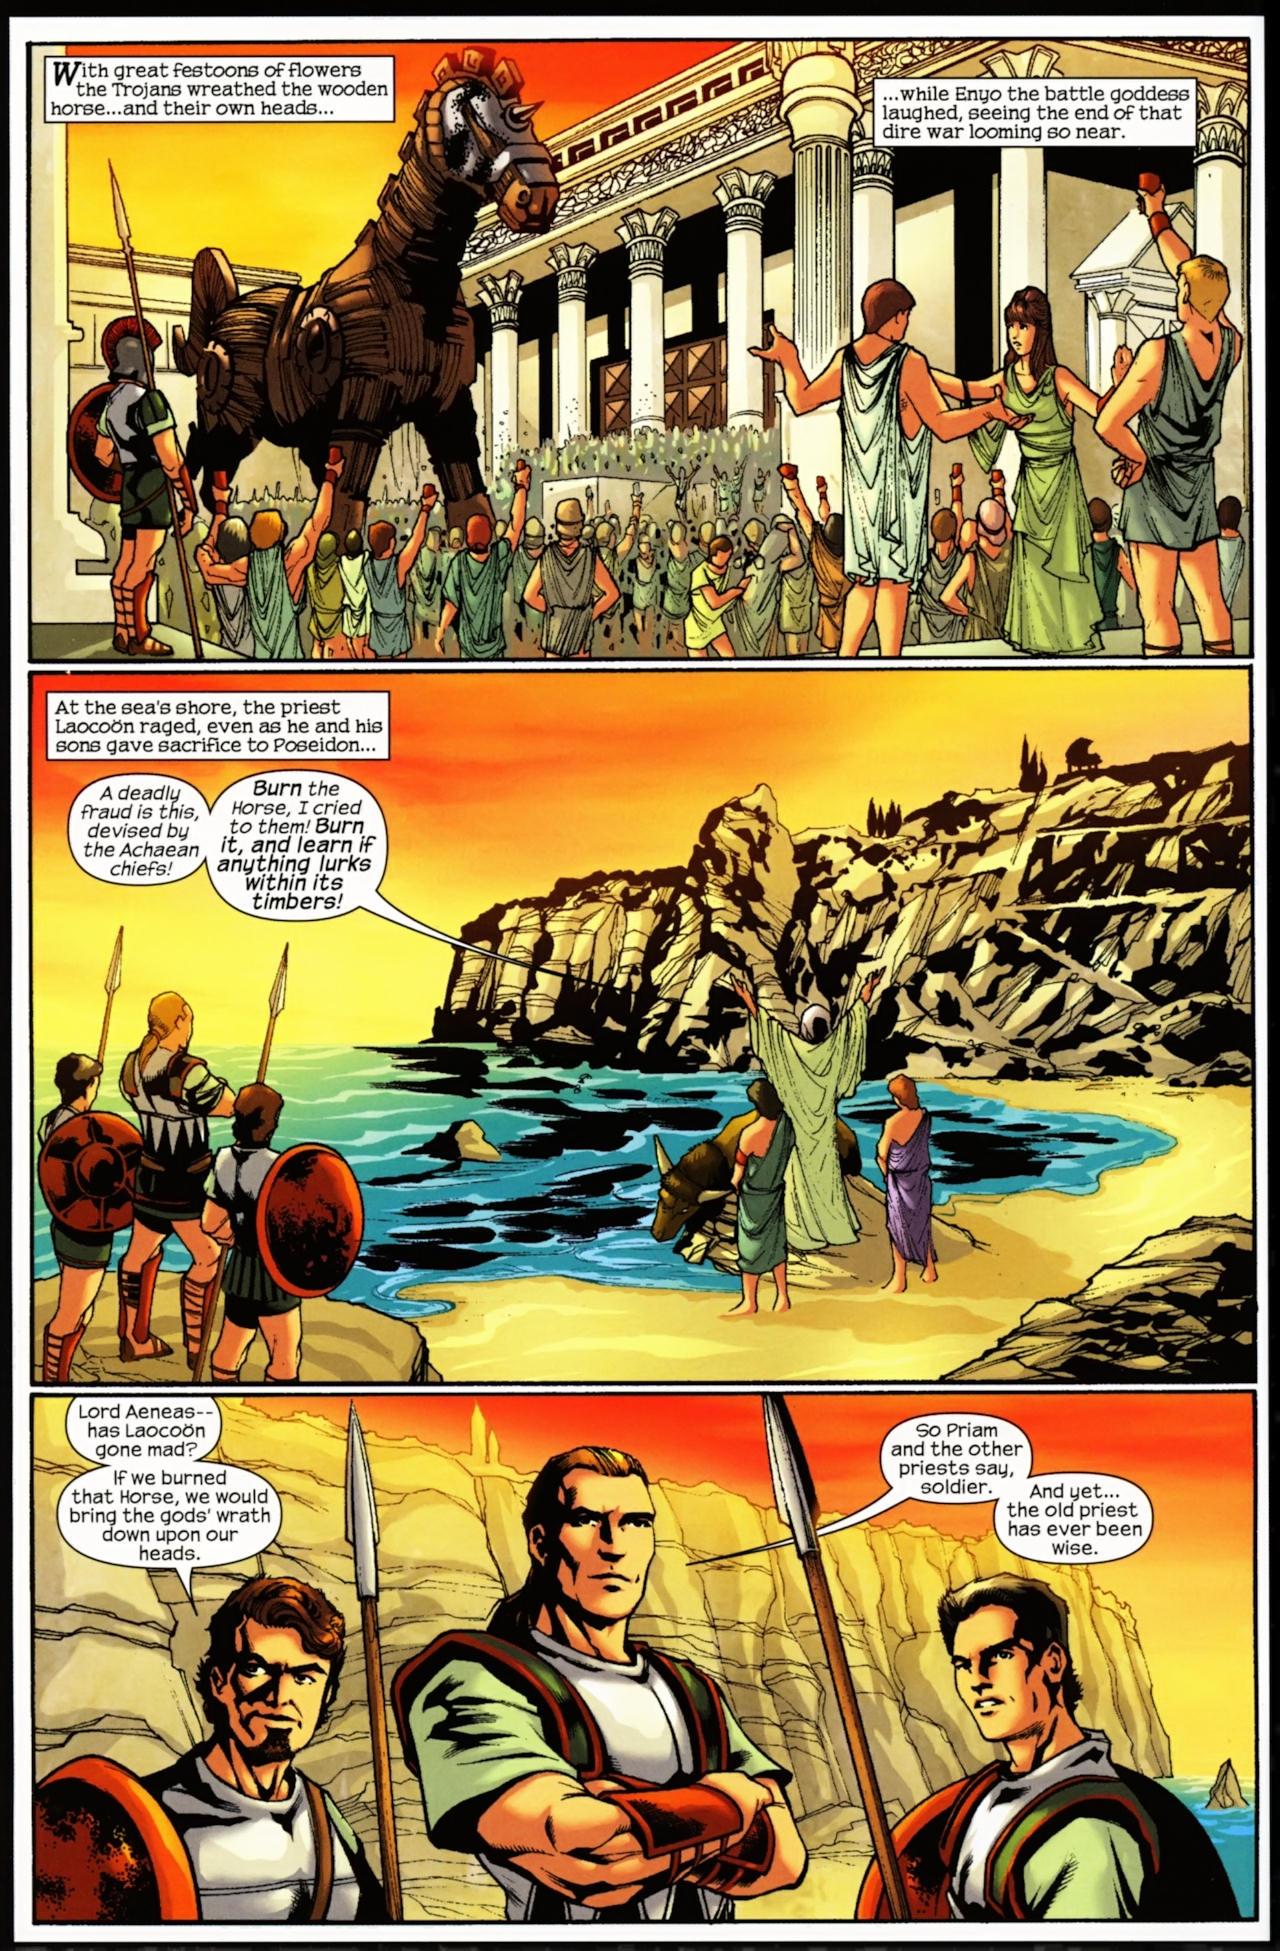 Read online Trojan War comic -  Issue #5 - 3